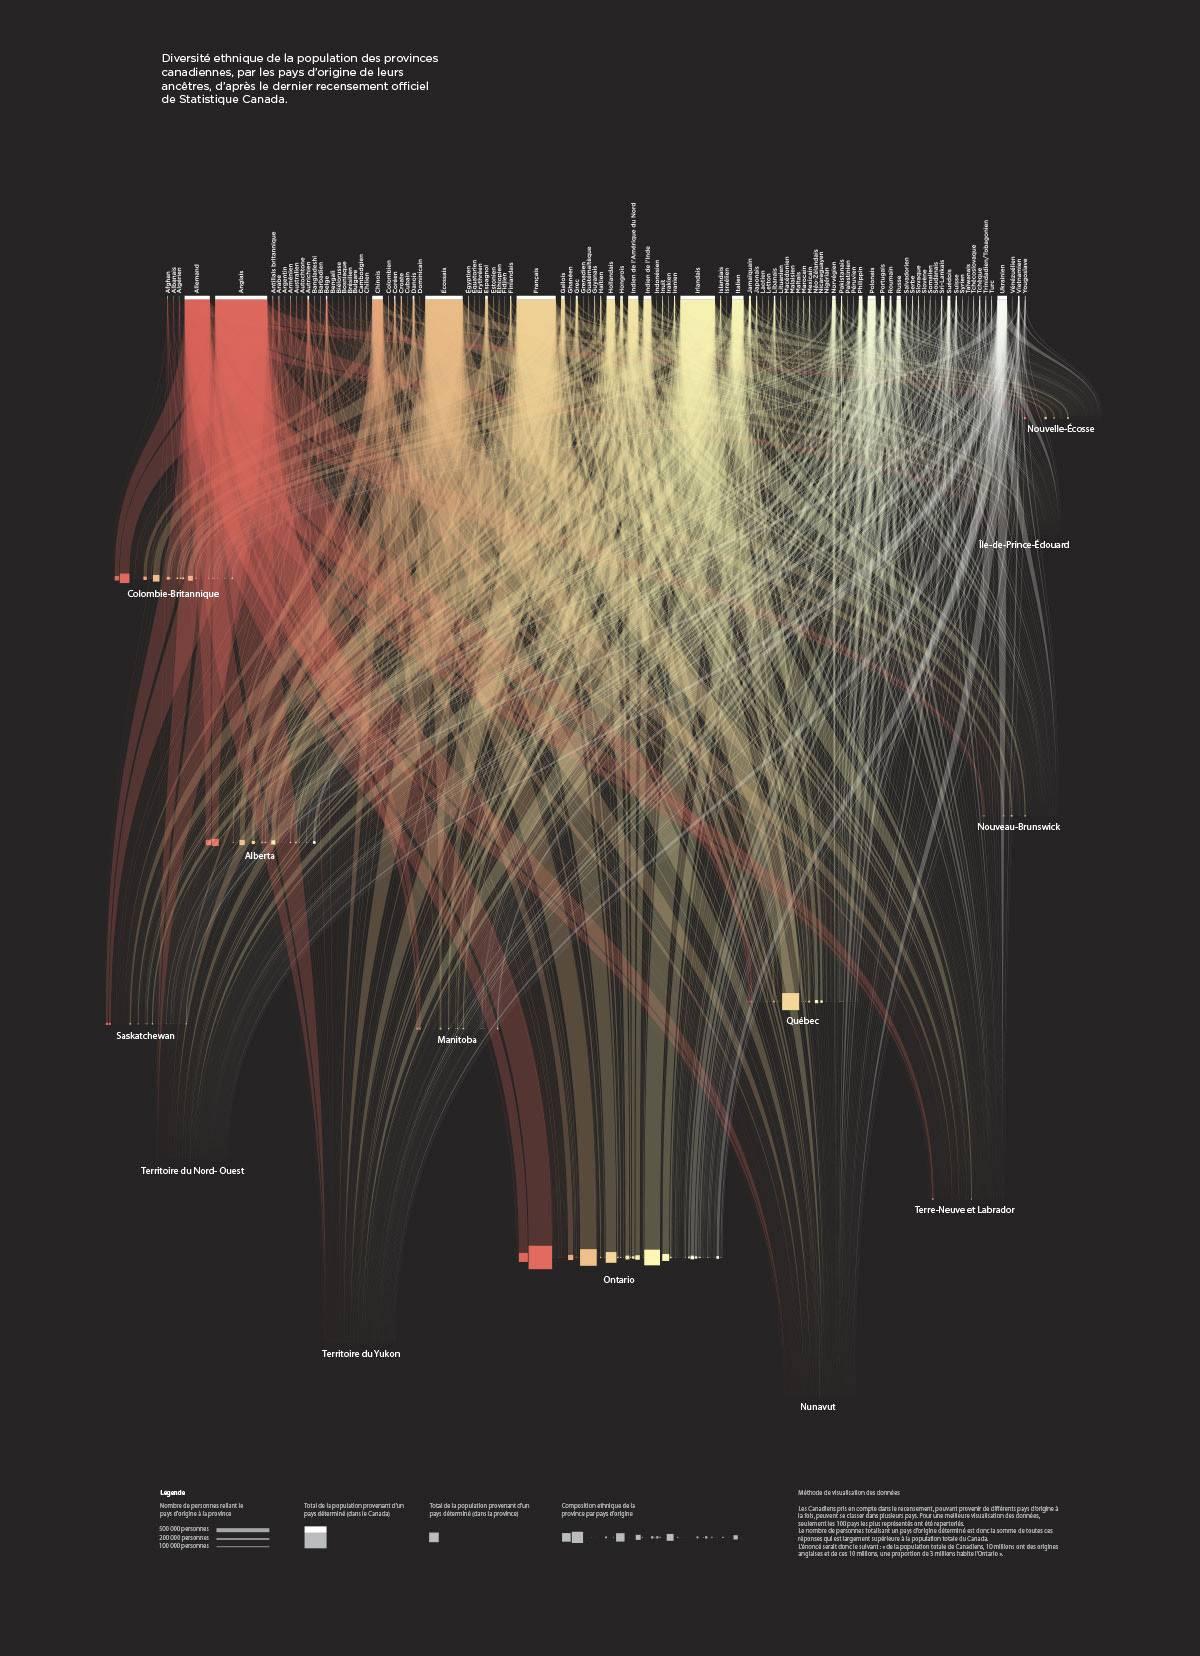 statistics data visualization, визуализация статистических данных, инфографика